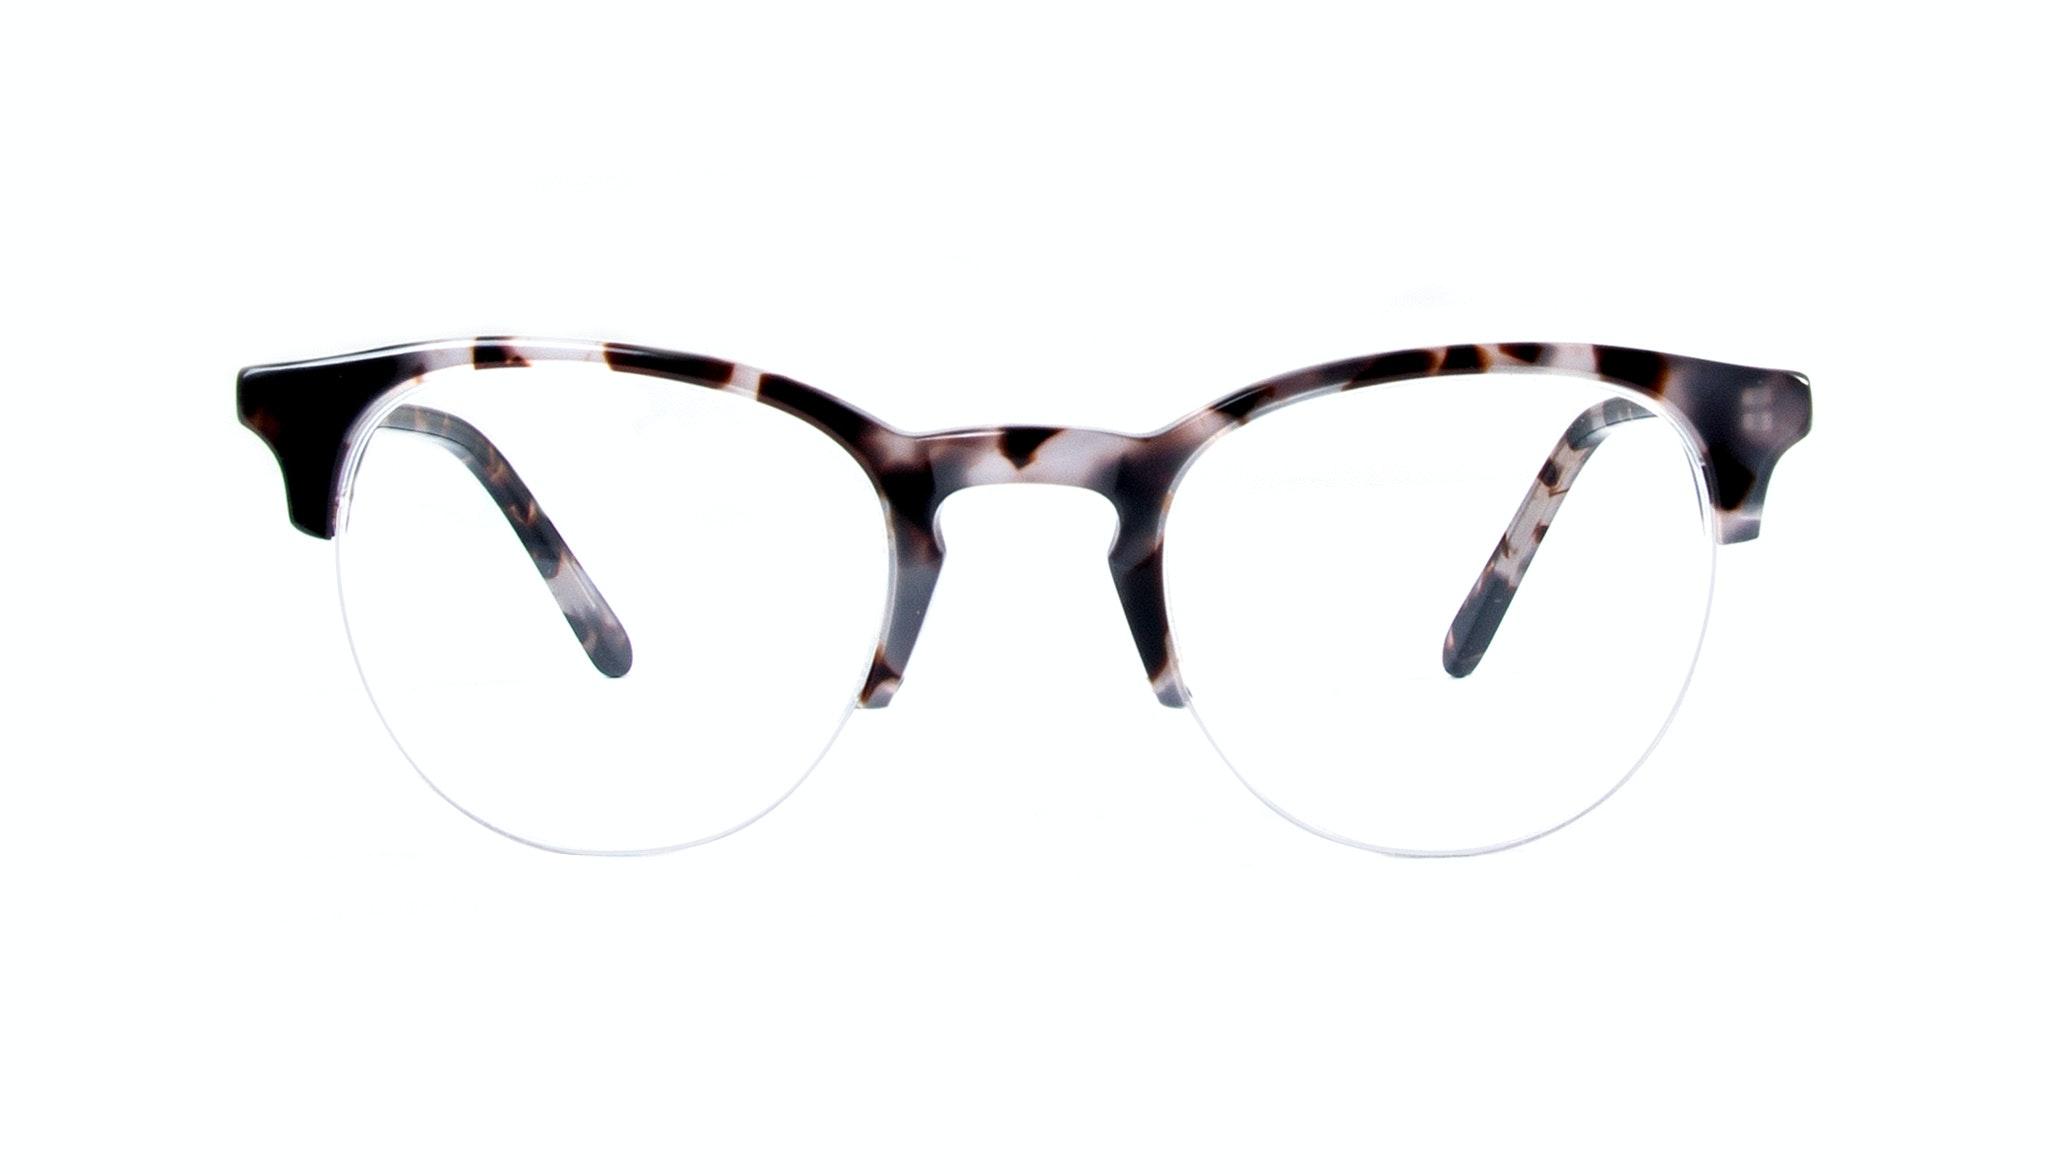 Affordable Fashion Glasses Round Semi-Rimless Eyeglasses Women Cult Light Mocha Tortoise Front